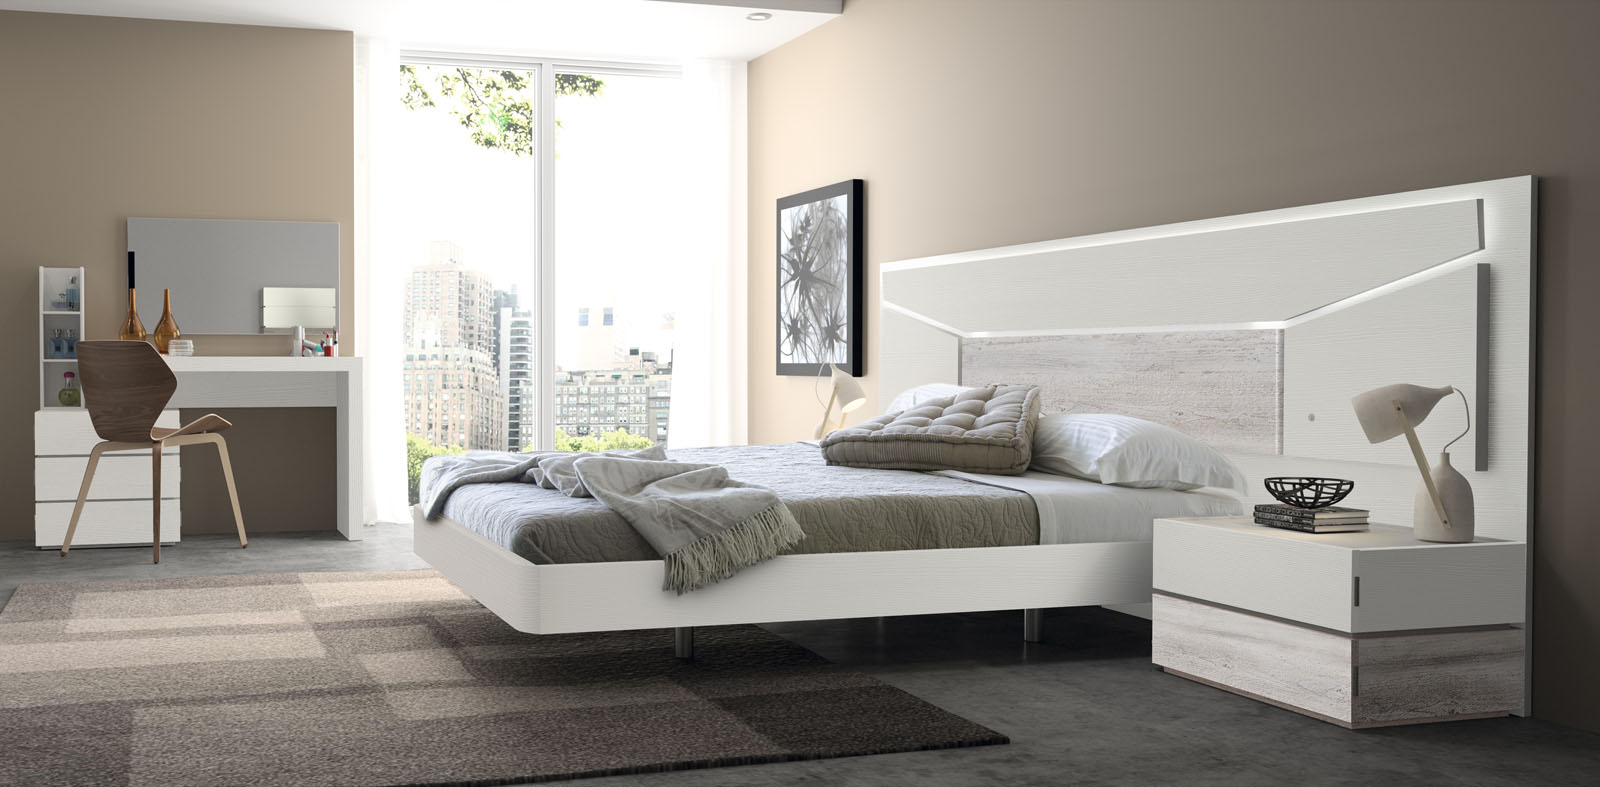 Dormitorio matrimonio moderno con leds - Makro Mueble